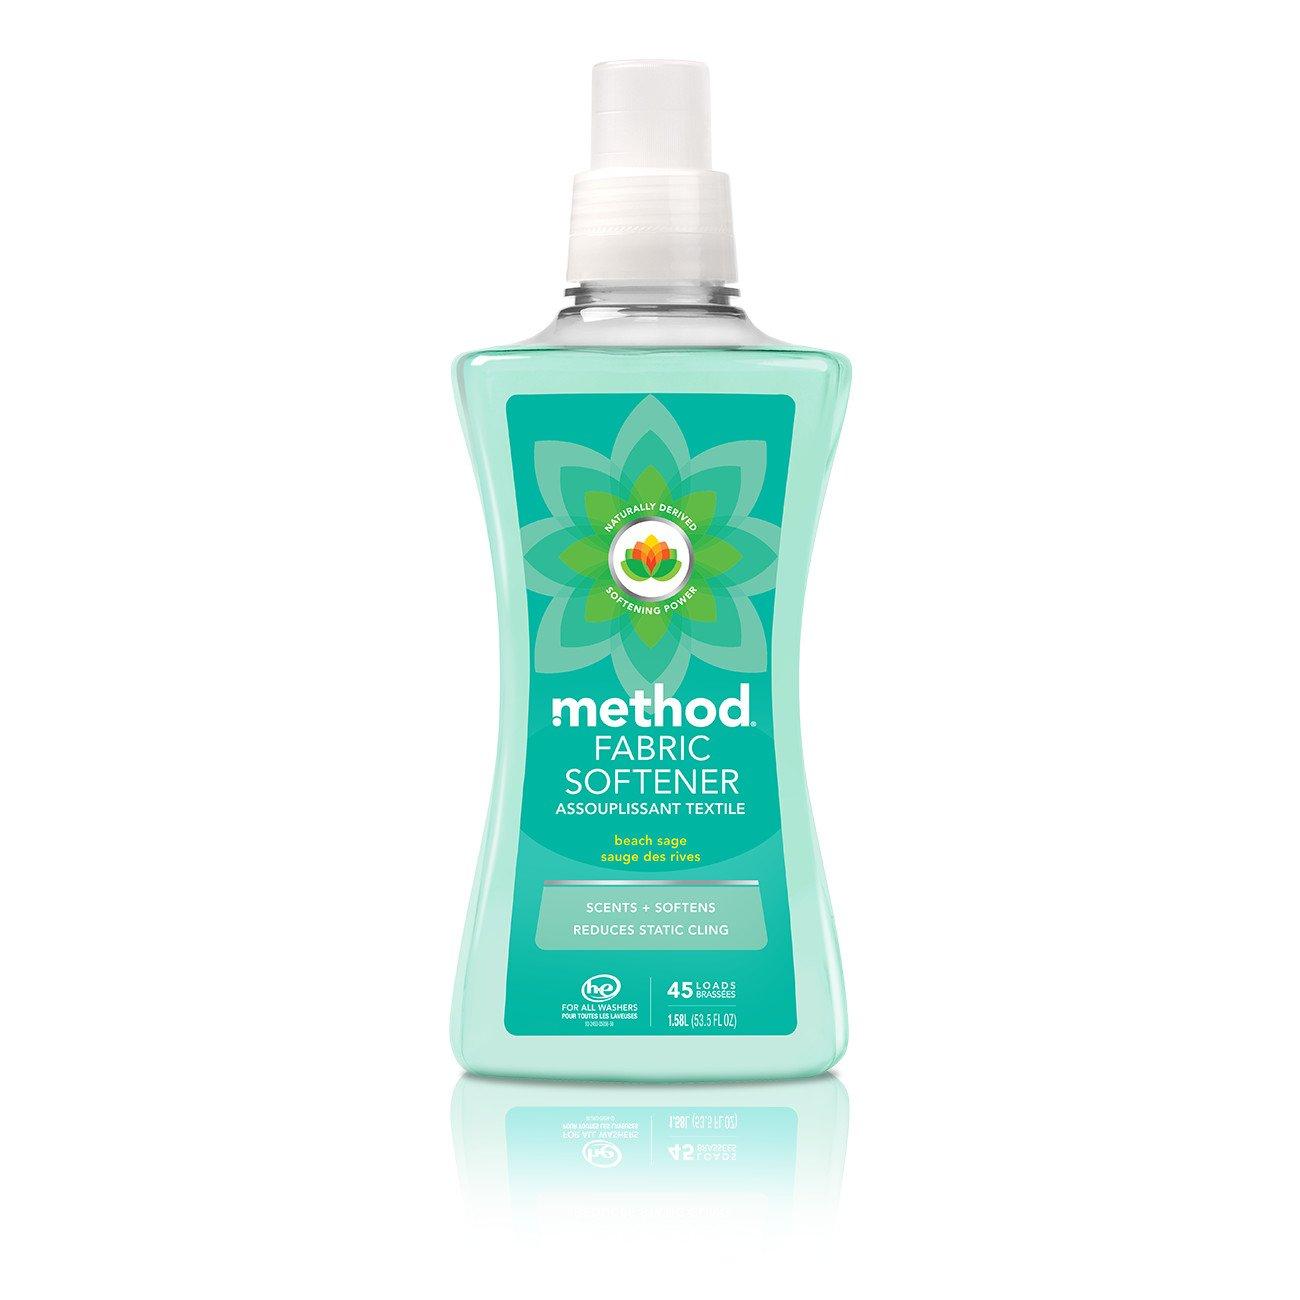 Method Fabric Softener, Beach Sage, 53.5 Ounces, 45 Loads